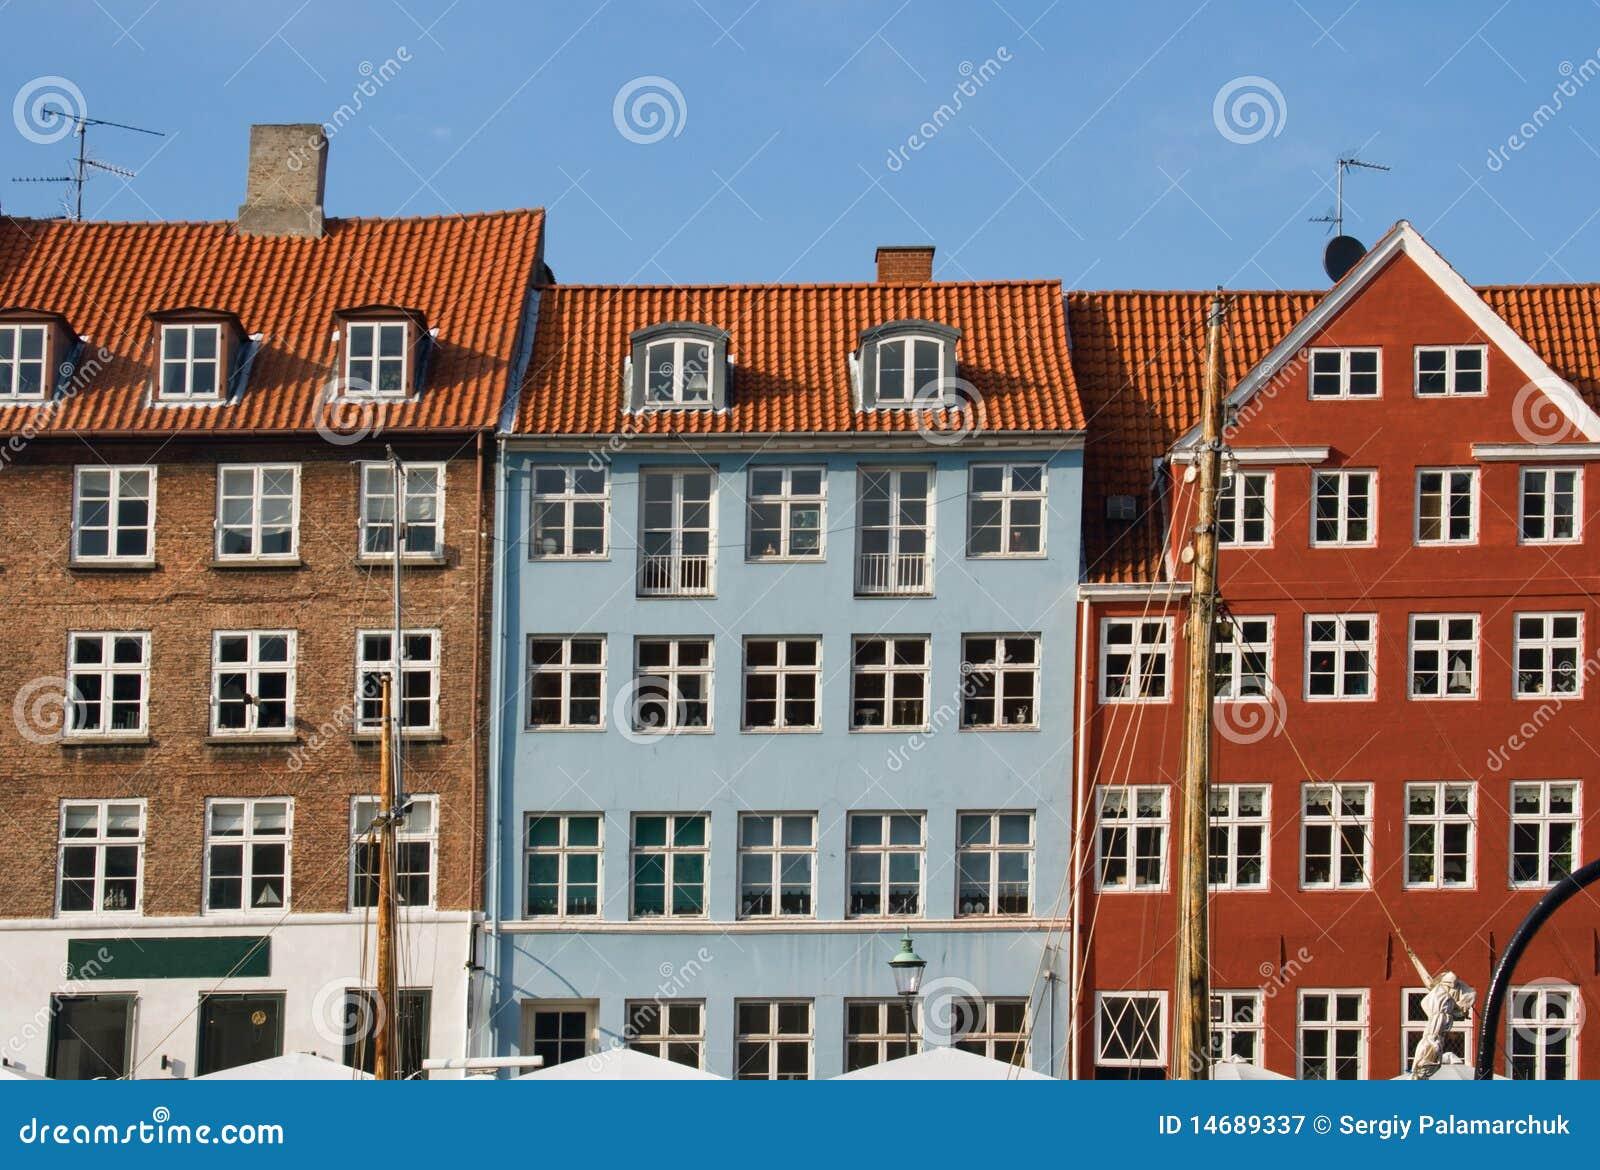 Copenhagen Houses Royalty Free Stock Photography Image